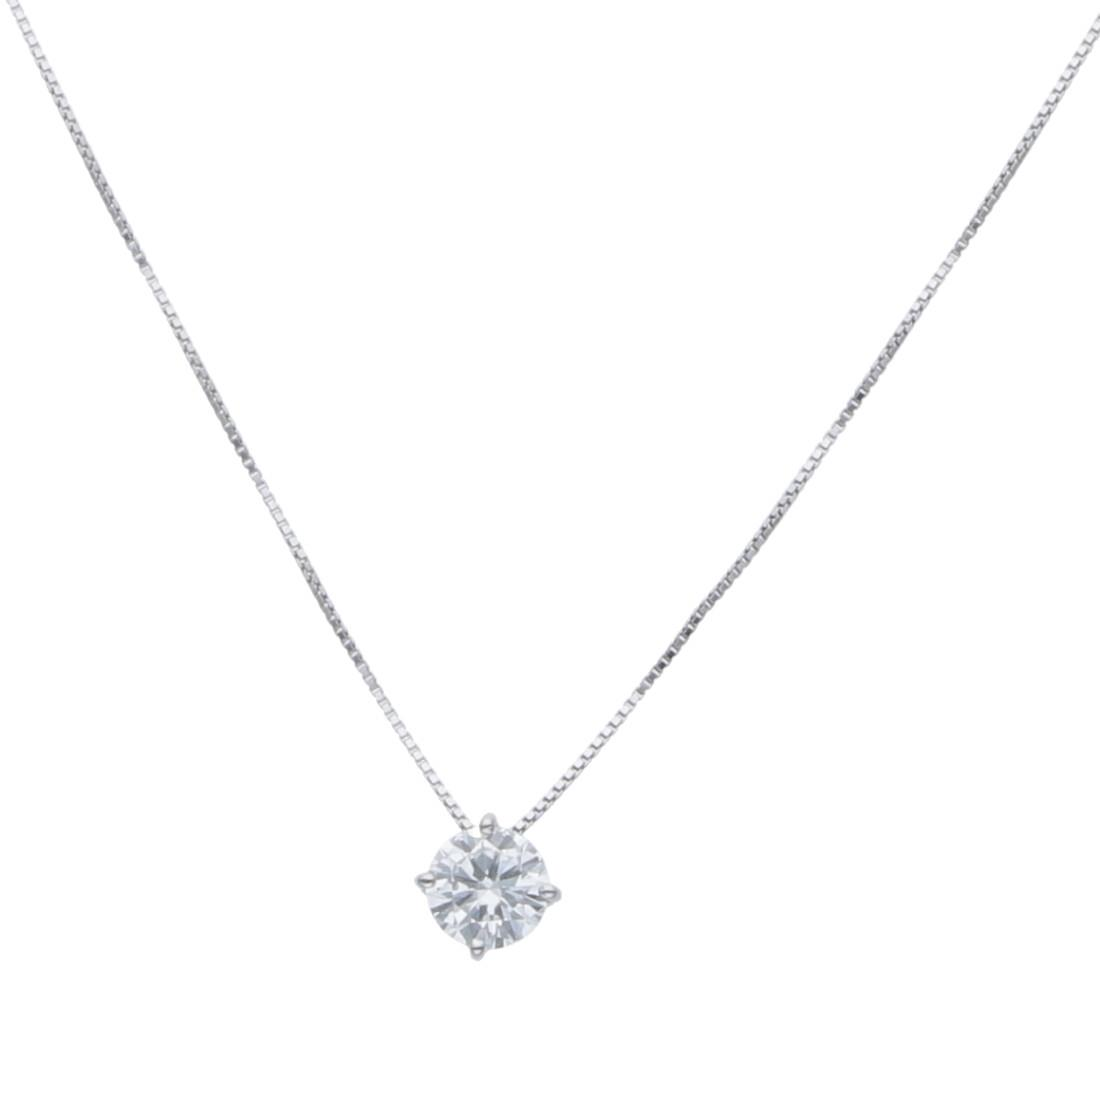 Collana punto luce con diamanti ct. 0,72 - ALFIERI & ST. JOHN